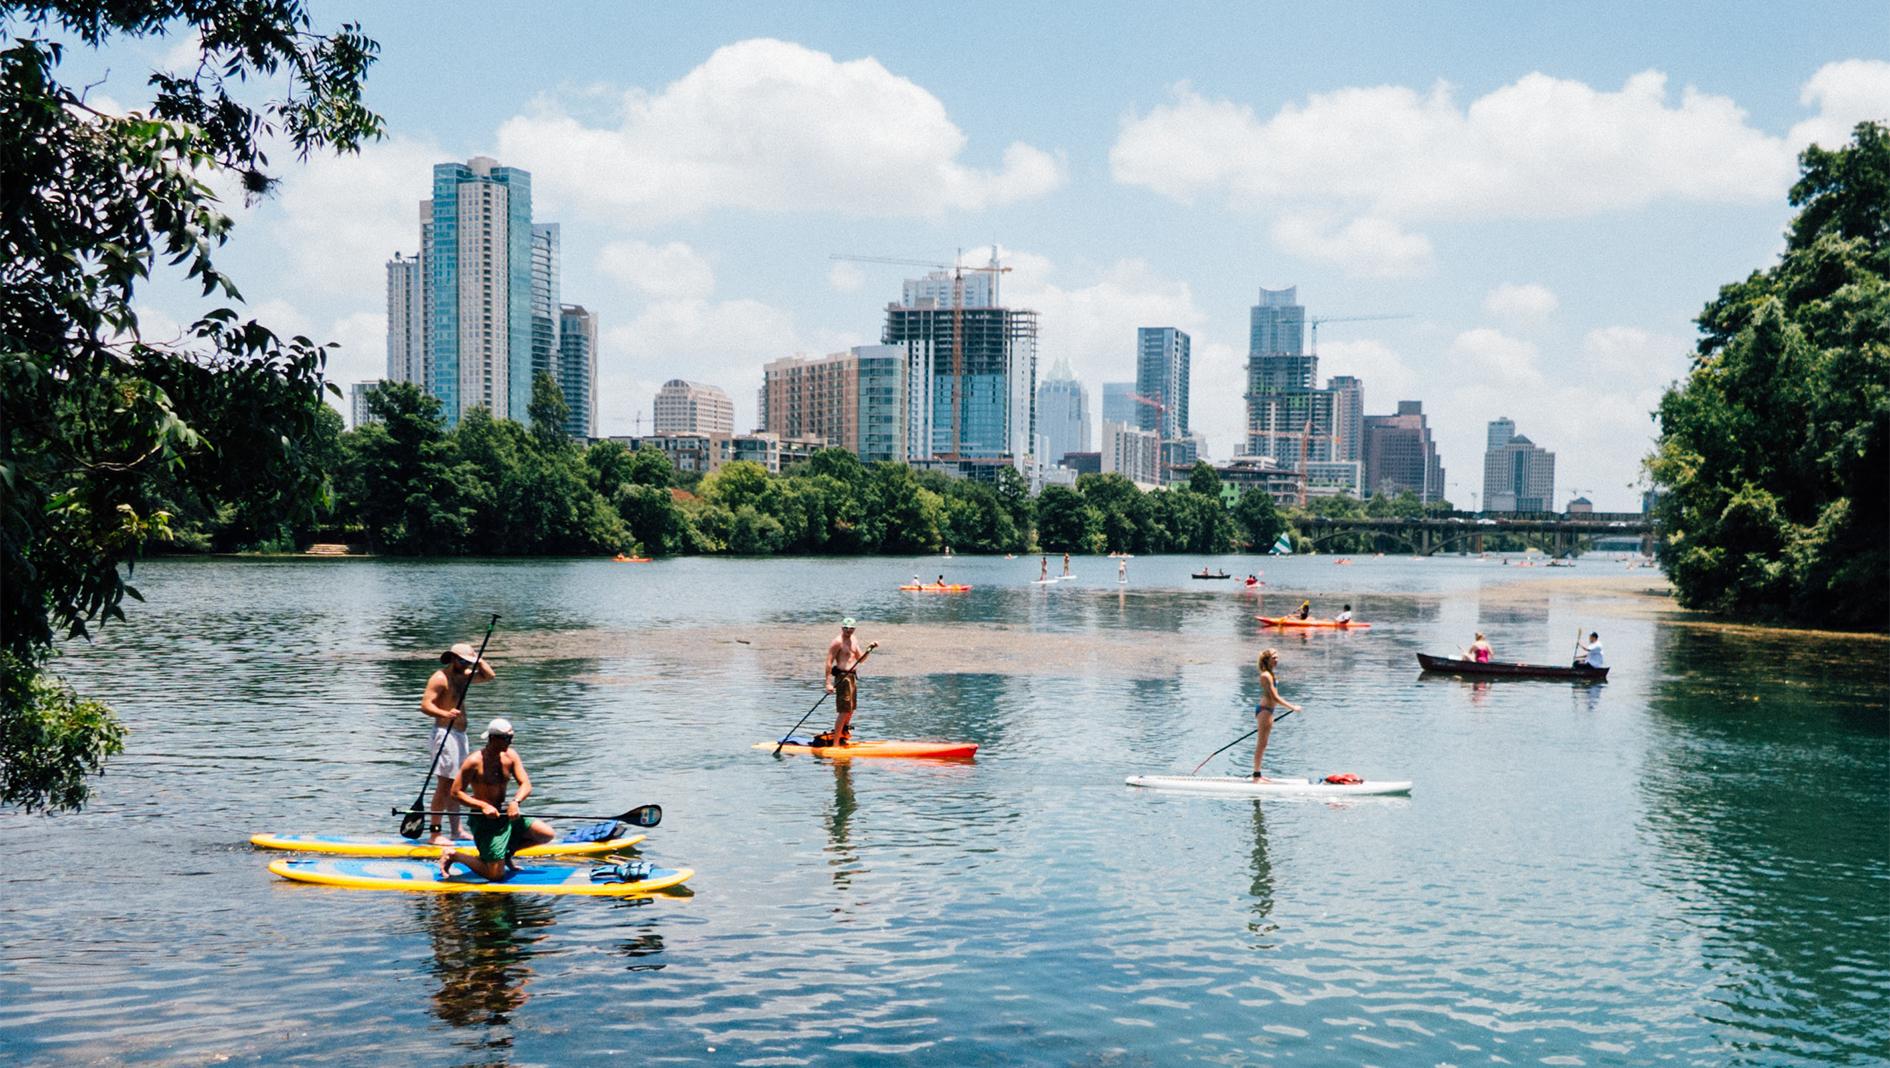 Individual paddle boarding at Lady Bird Lake in Austin, Texas.